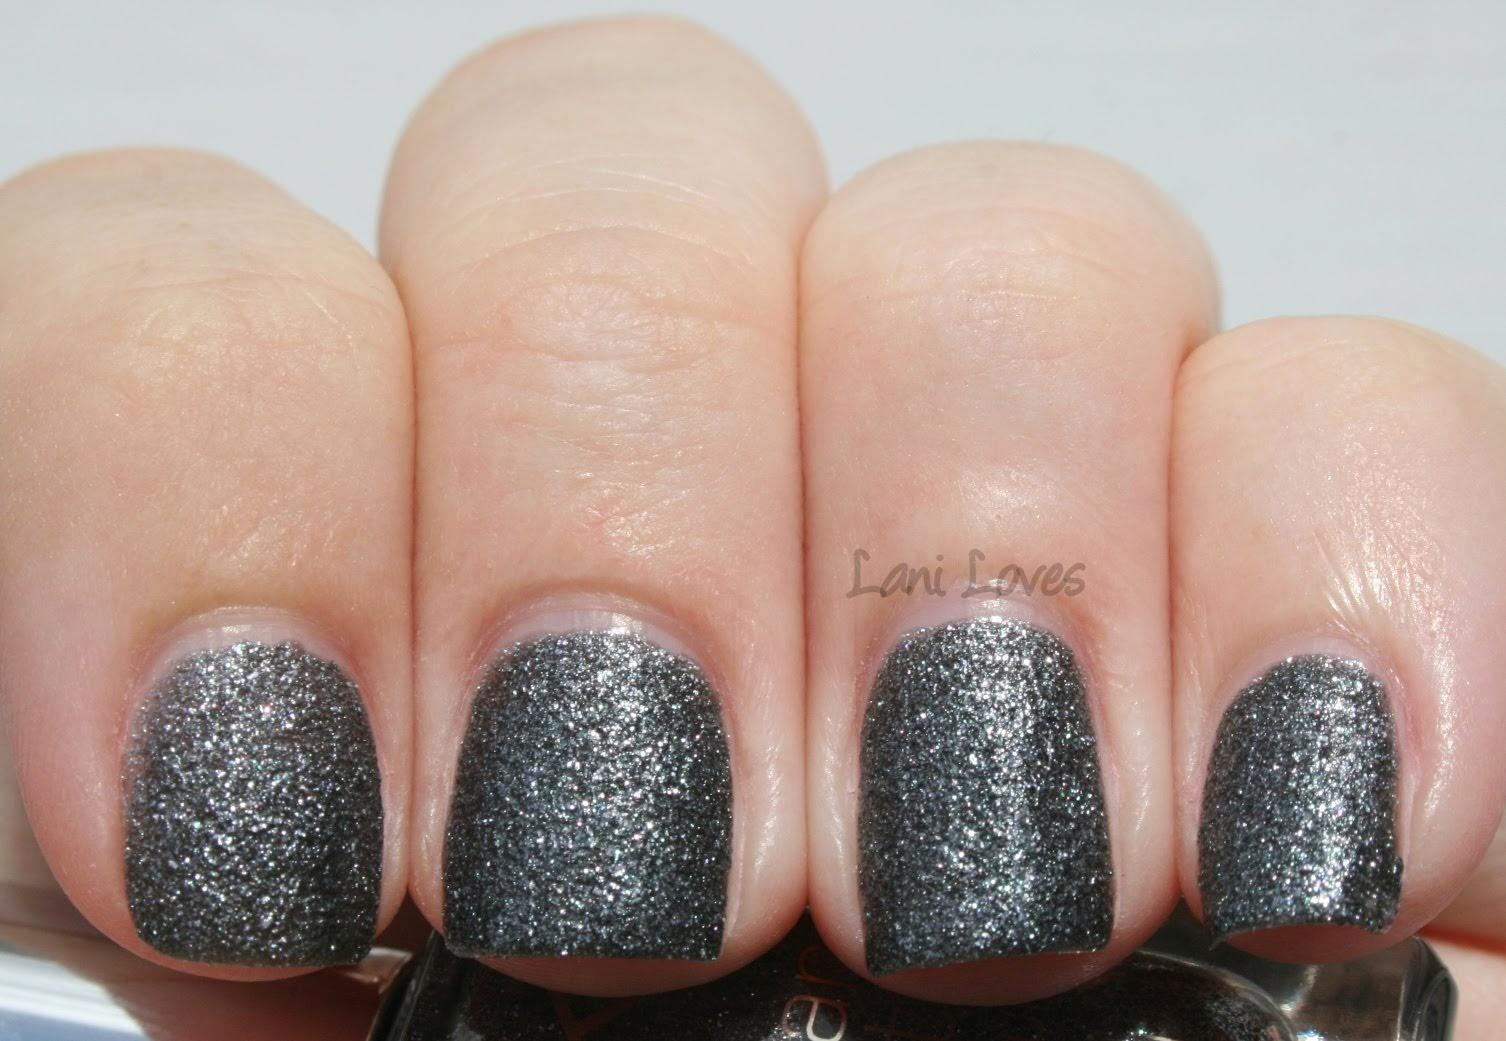 Kiko Sugar Mat Anthracite nail polish swatch & review